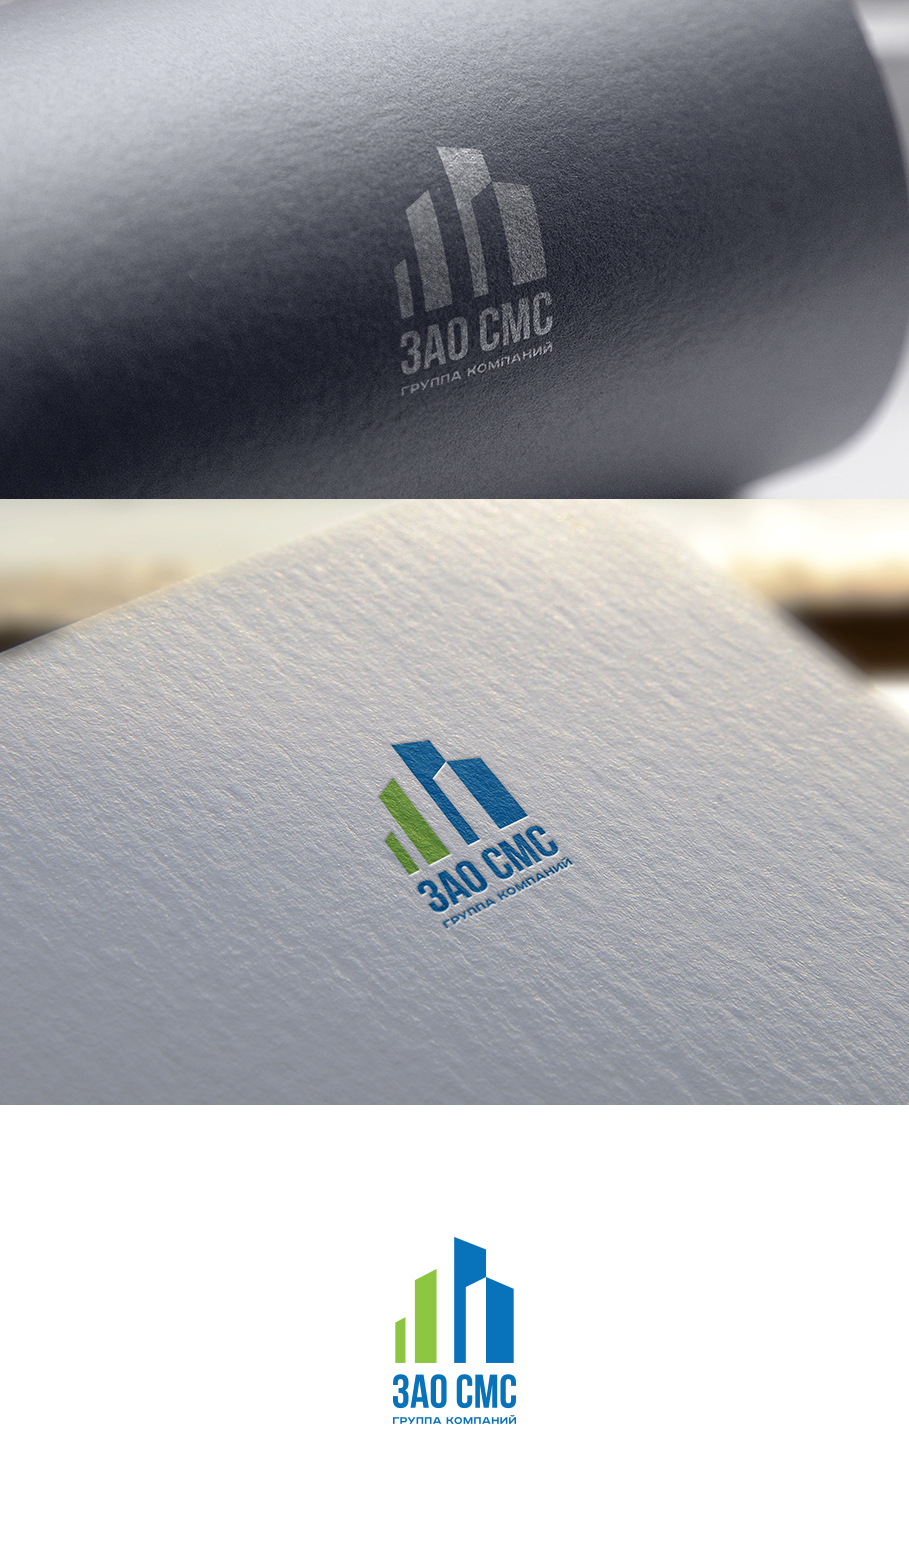 Дизайнер для разработки Логотипа для организации !СРОЧНО! фото f_9475a28b60755fa4.jpg